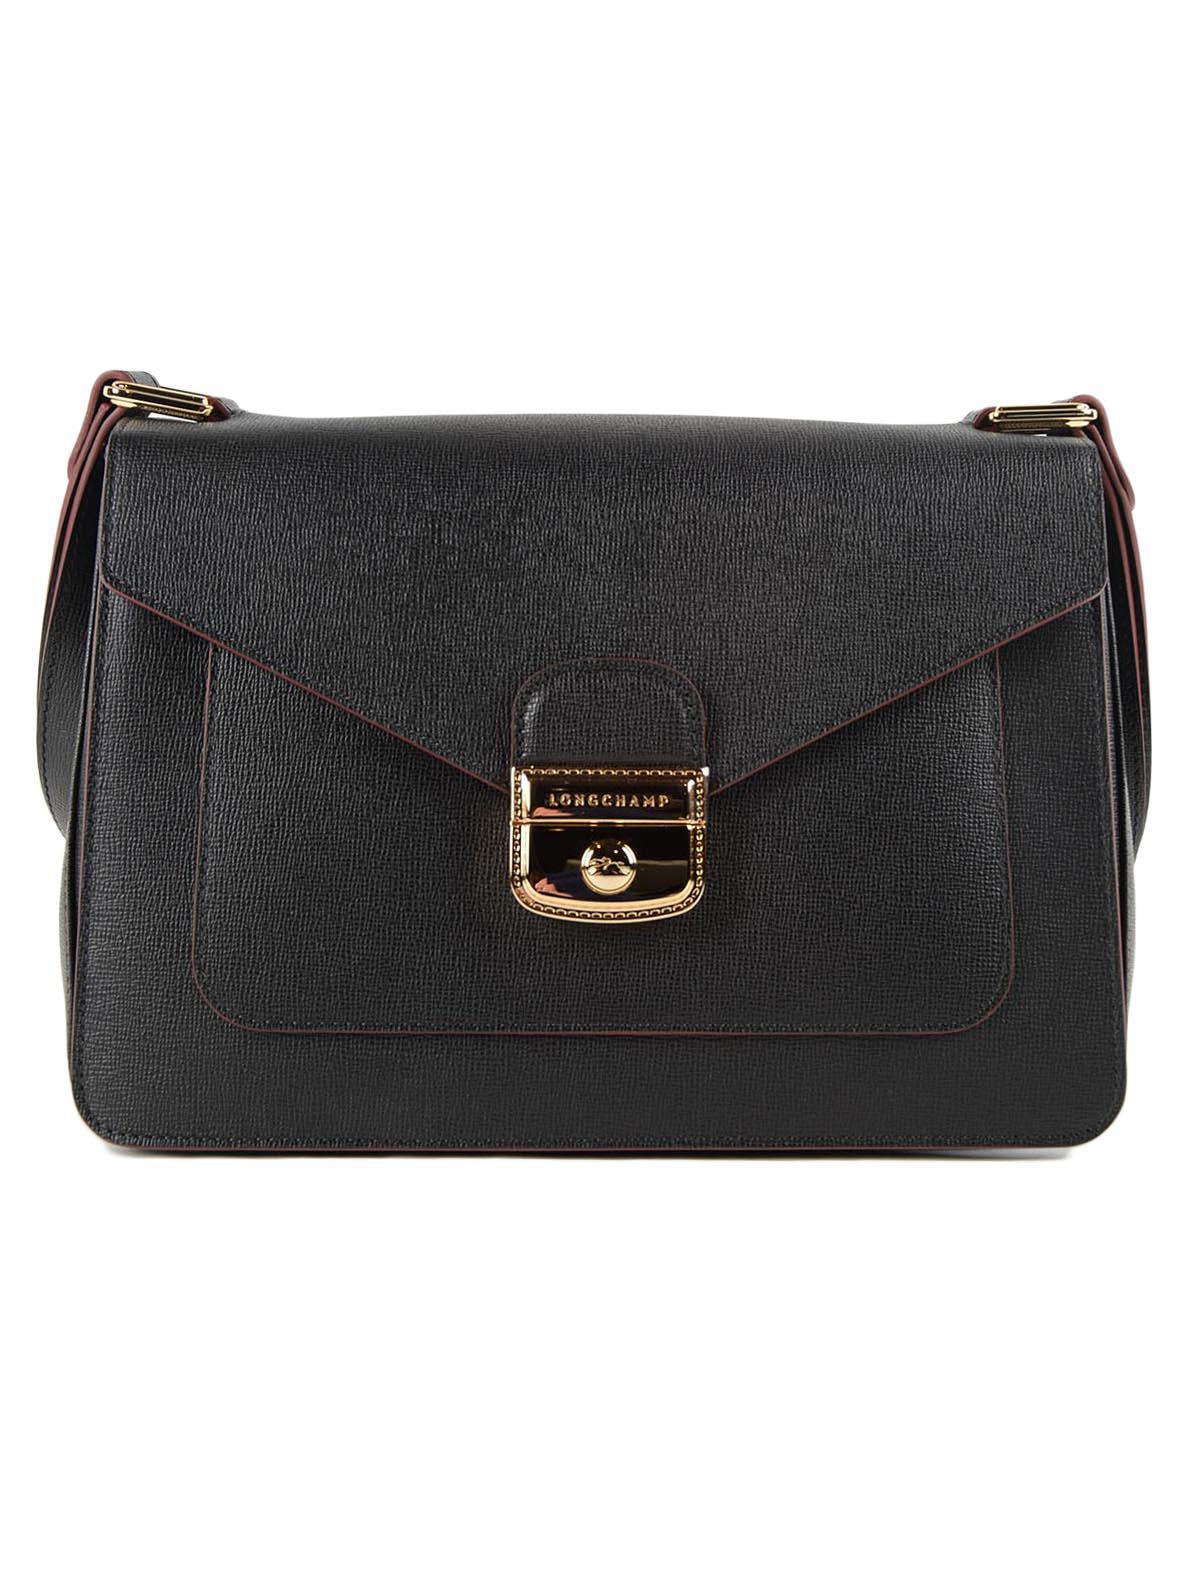 4368ea90dbe4 Longchamp - Black Le Pliage Heritage Shoulder Bag - Lyst. View fullscreen